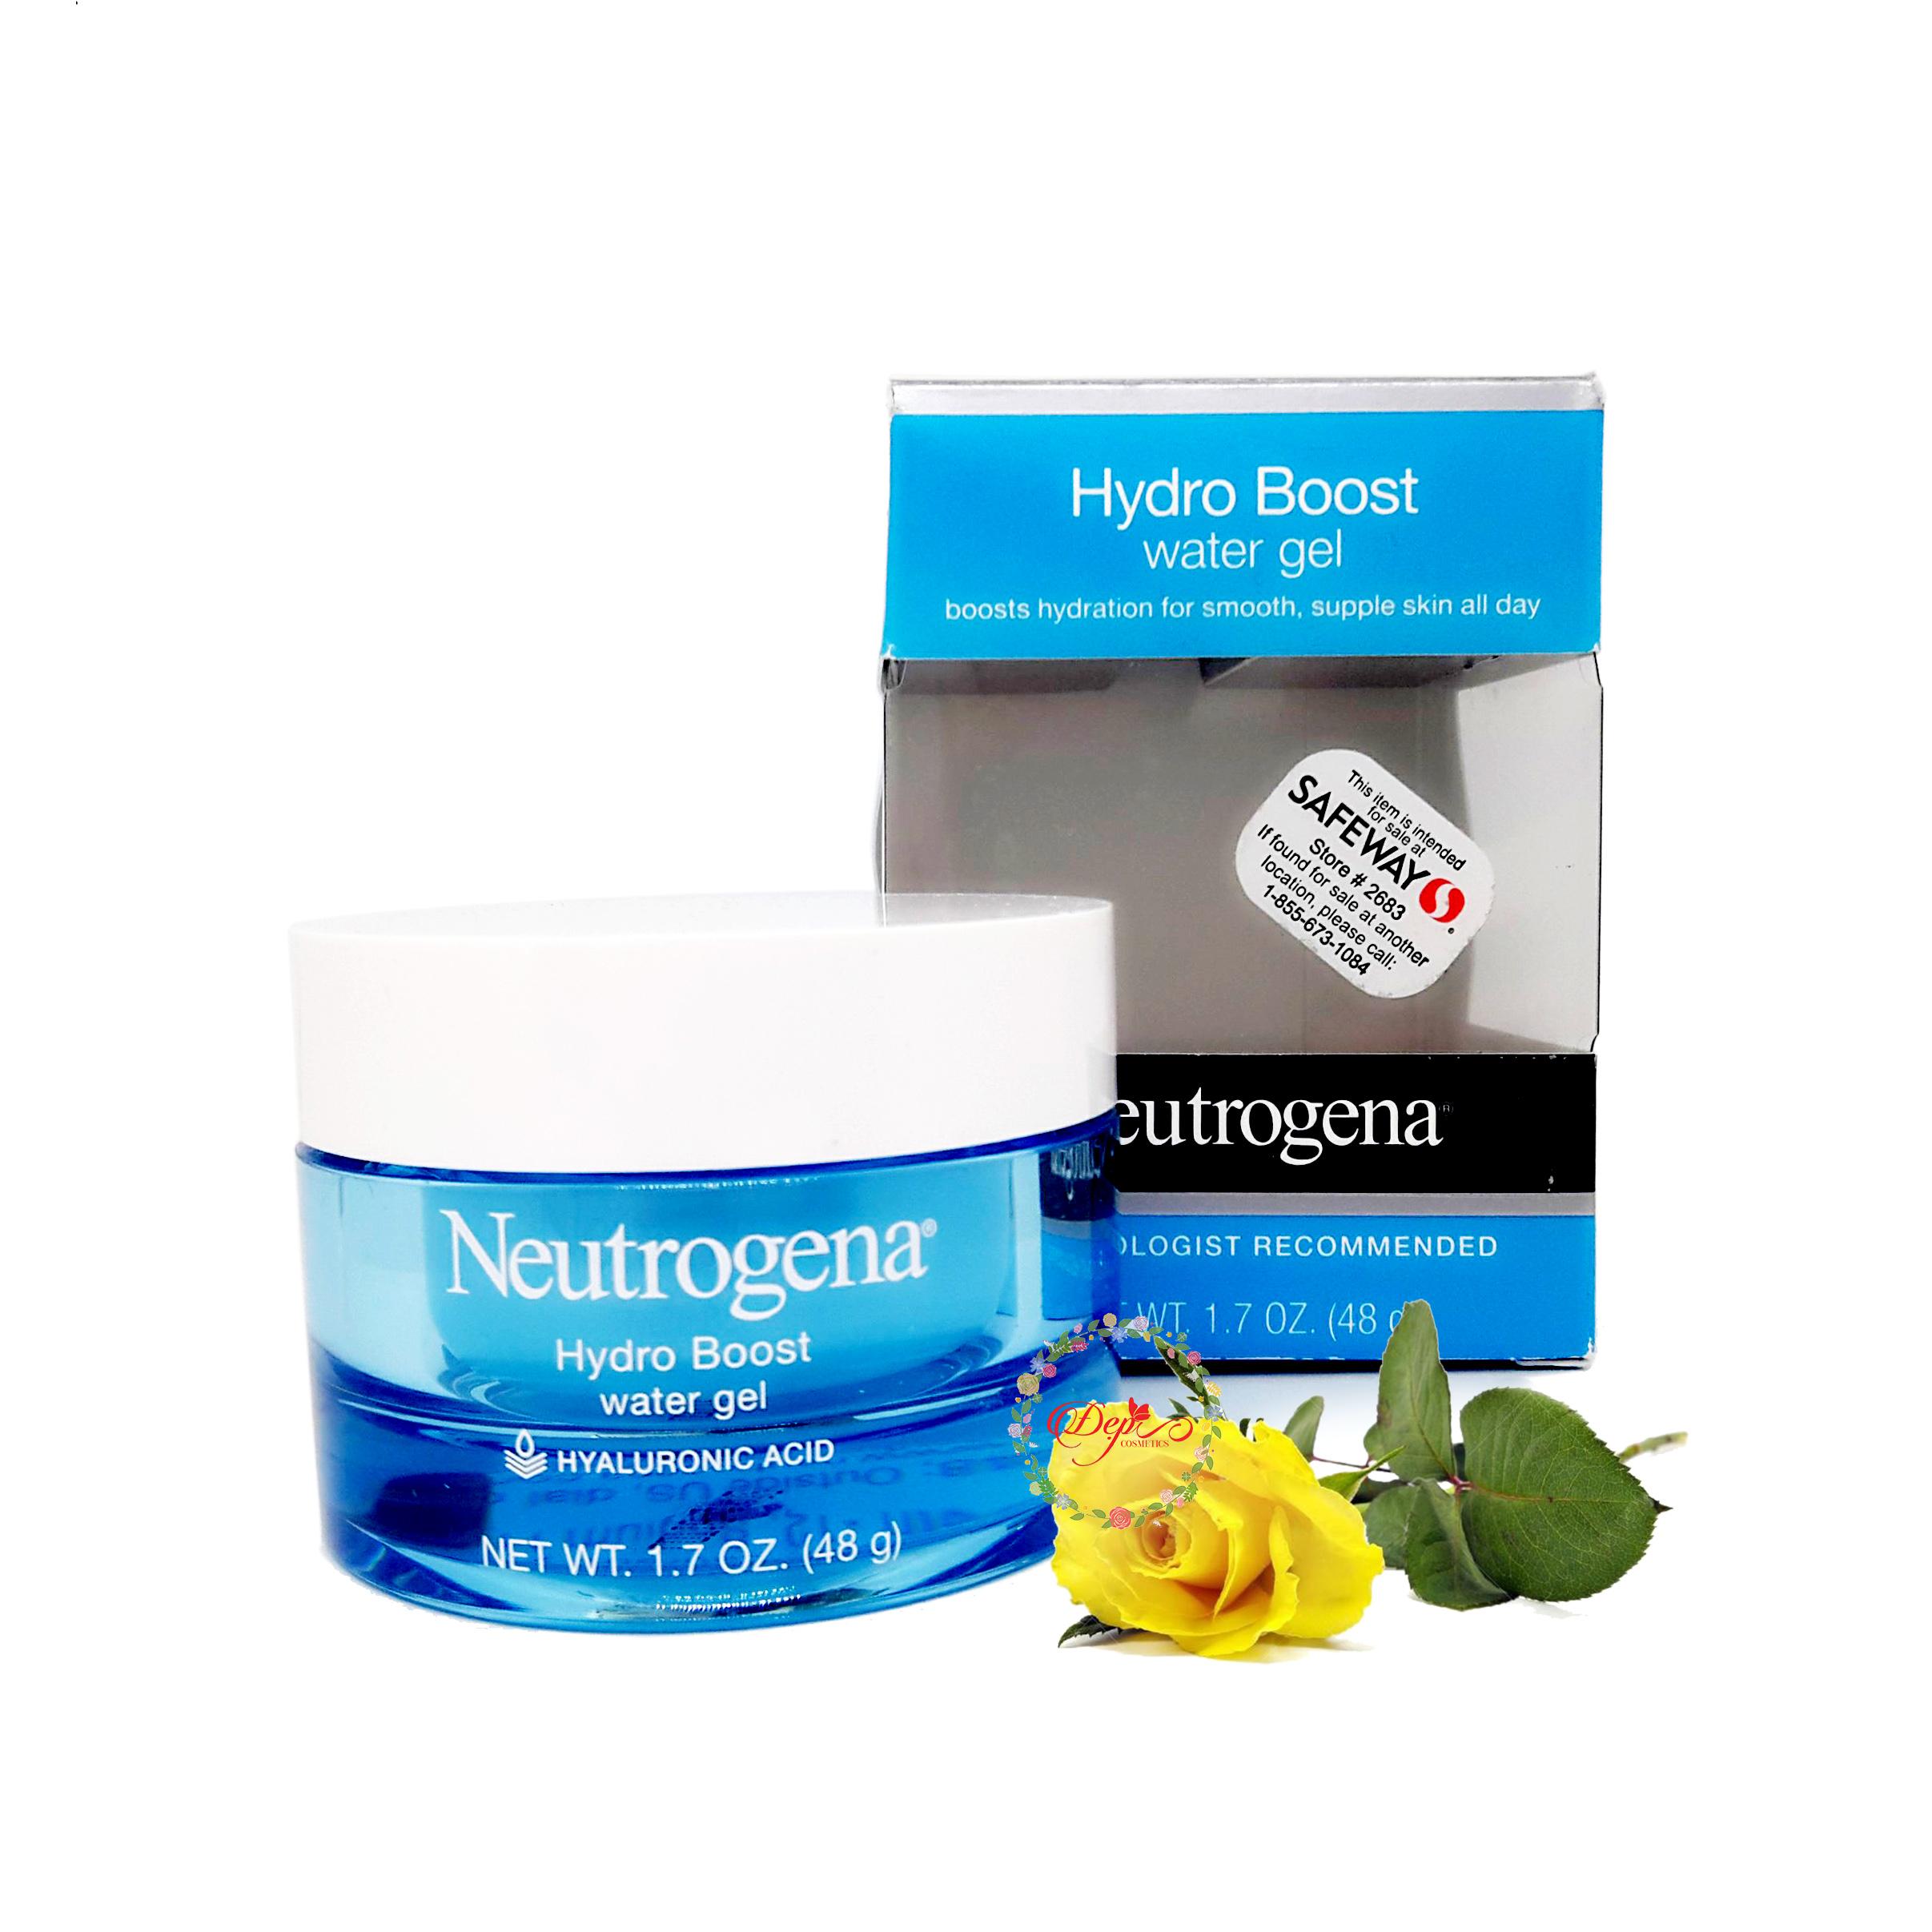 Kem dưỡng cho da dầu Neutrogena